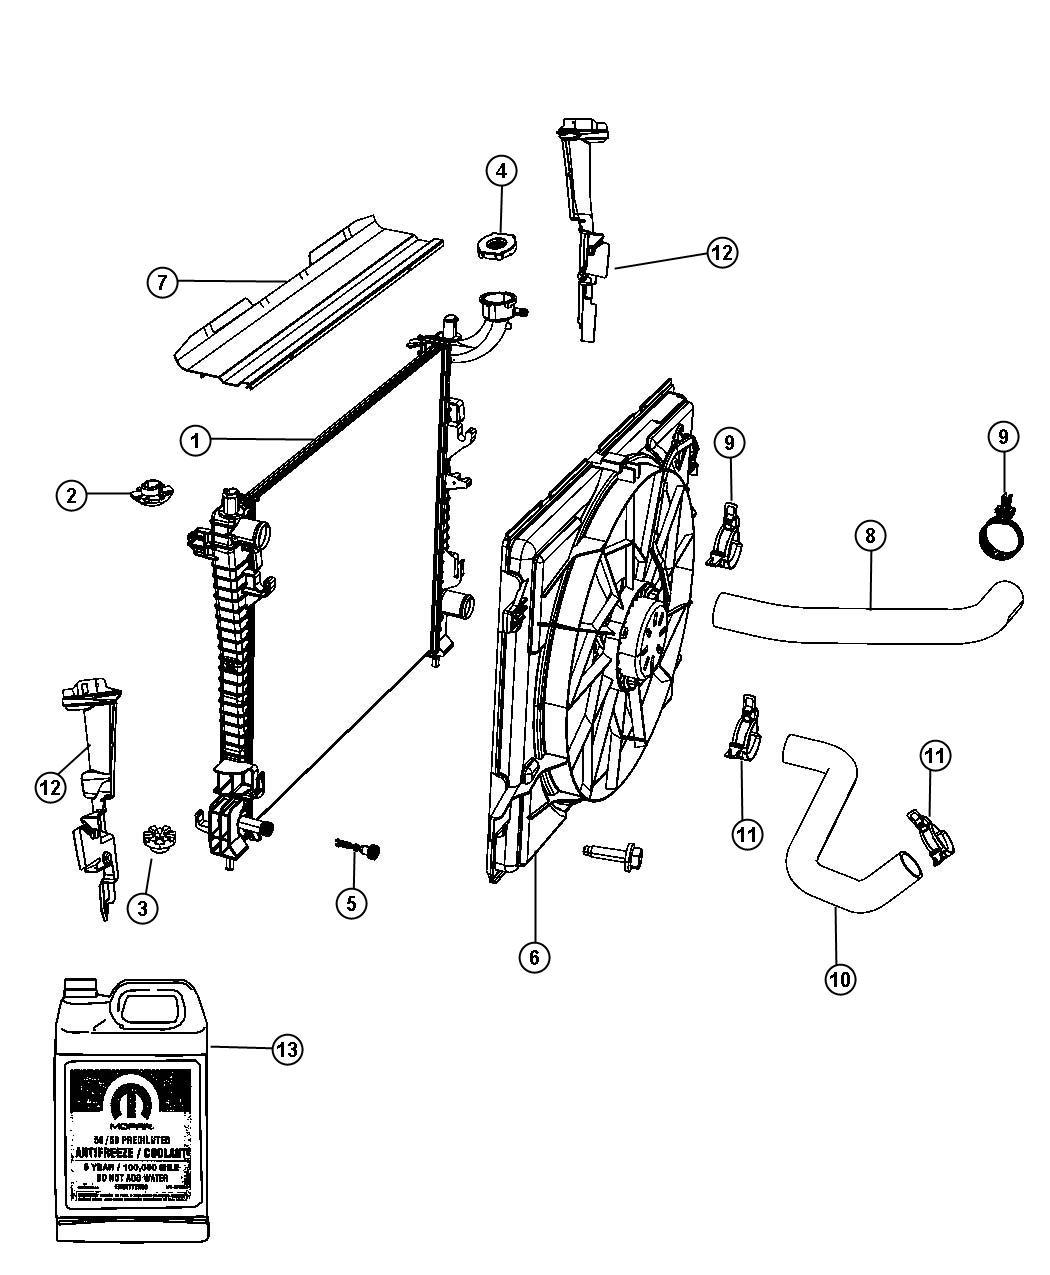 Dodge Durango Fan Module Radiator Cooling Export